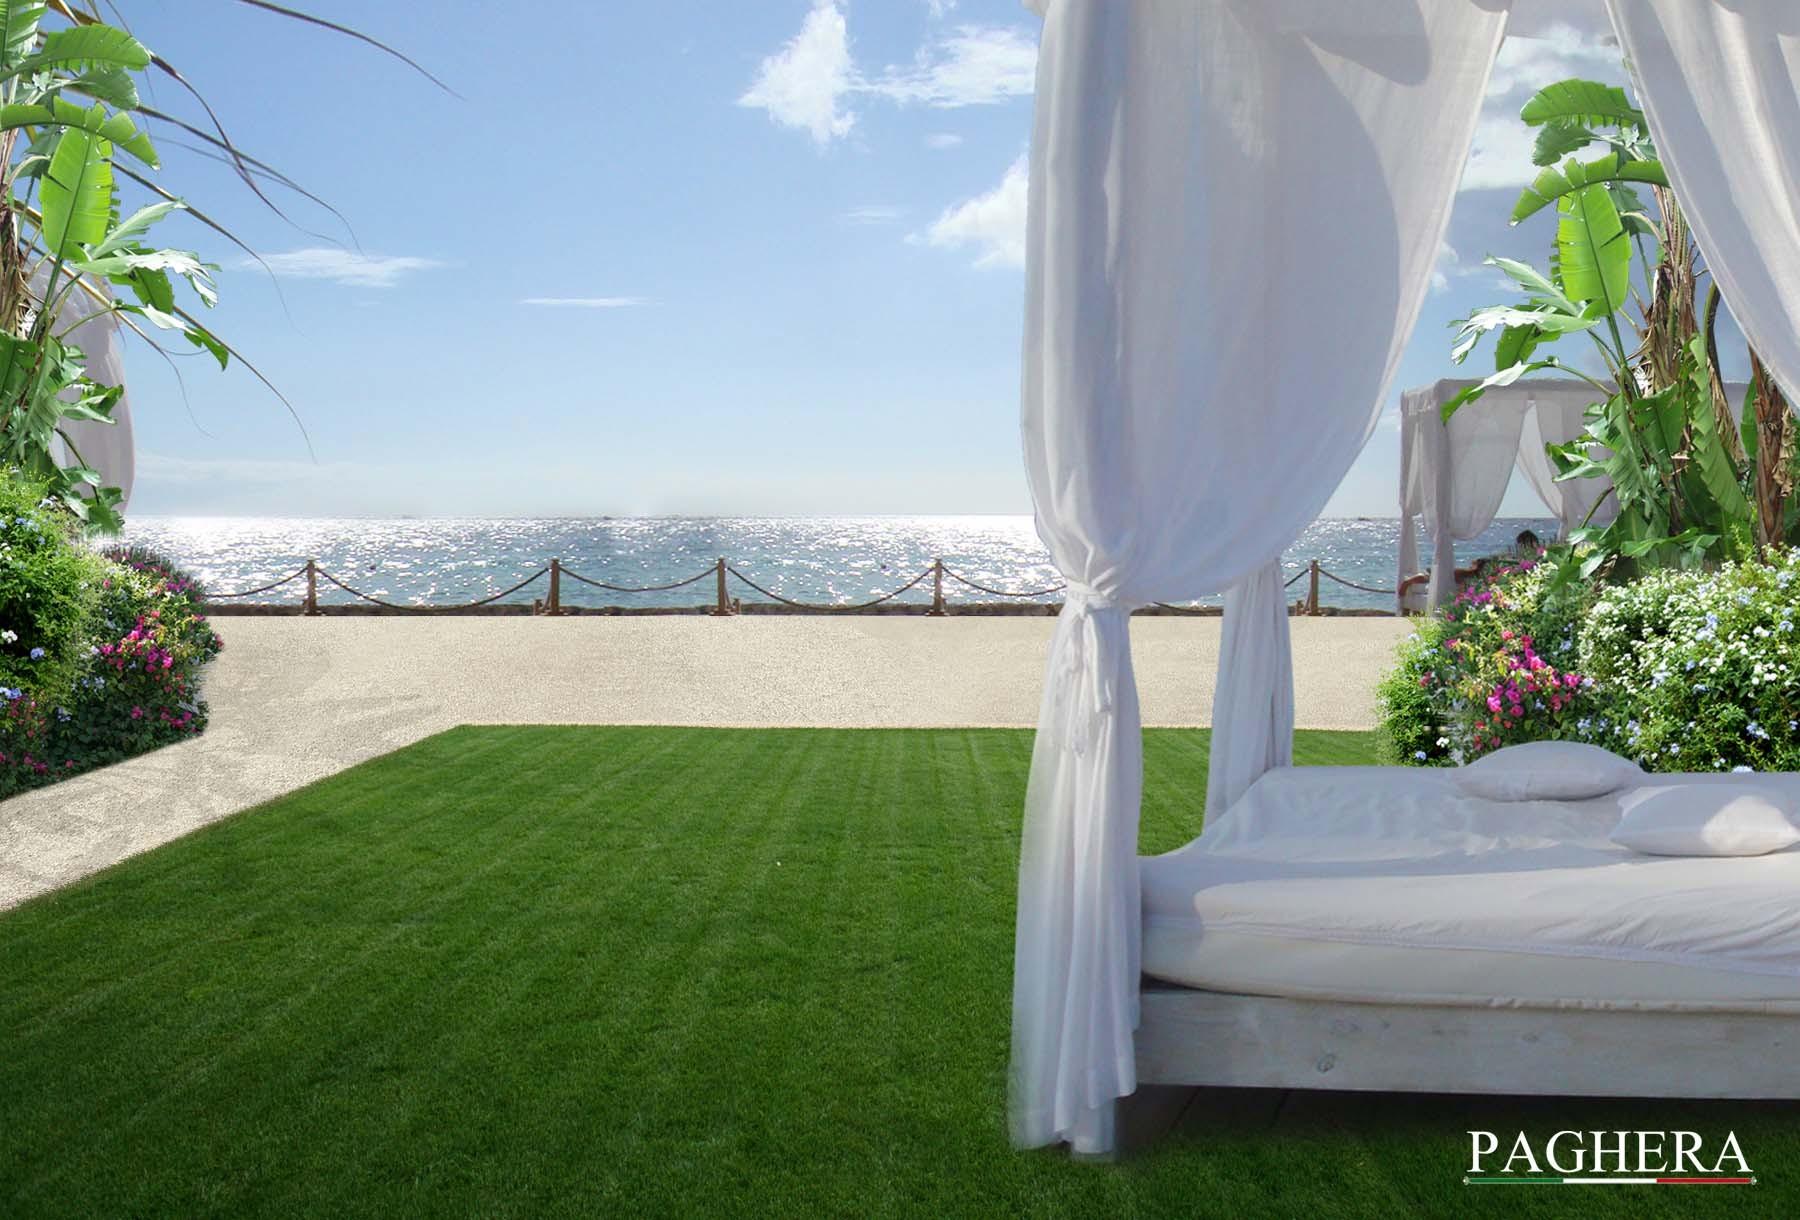 Rixos Premium Hotel Tekirova - Antalya Turkey - مجموعه های توریستی